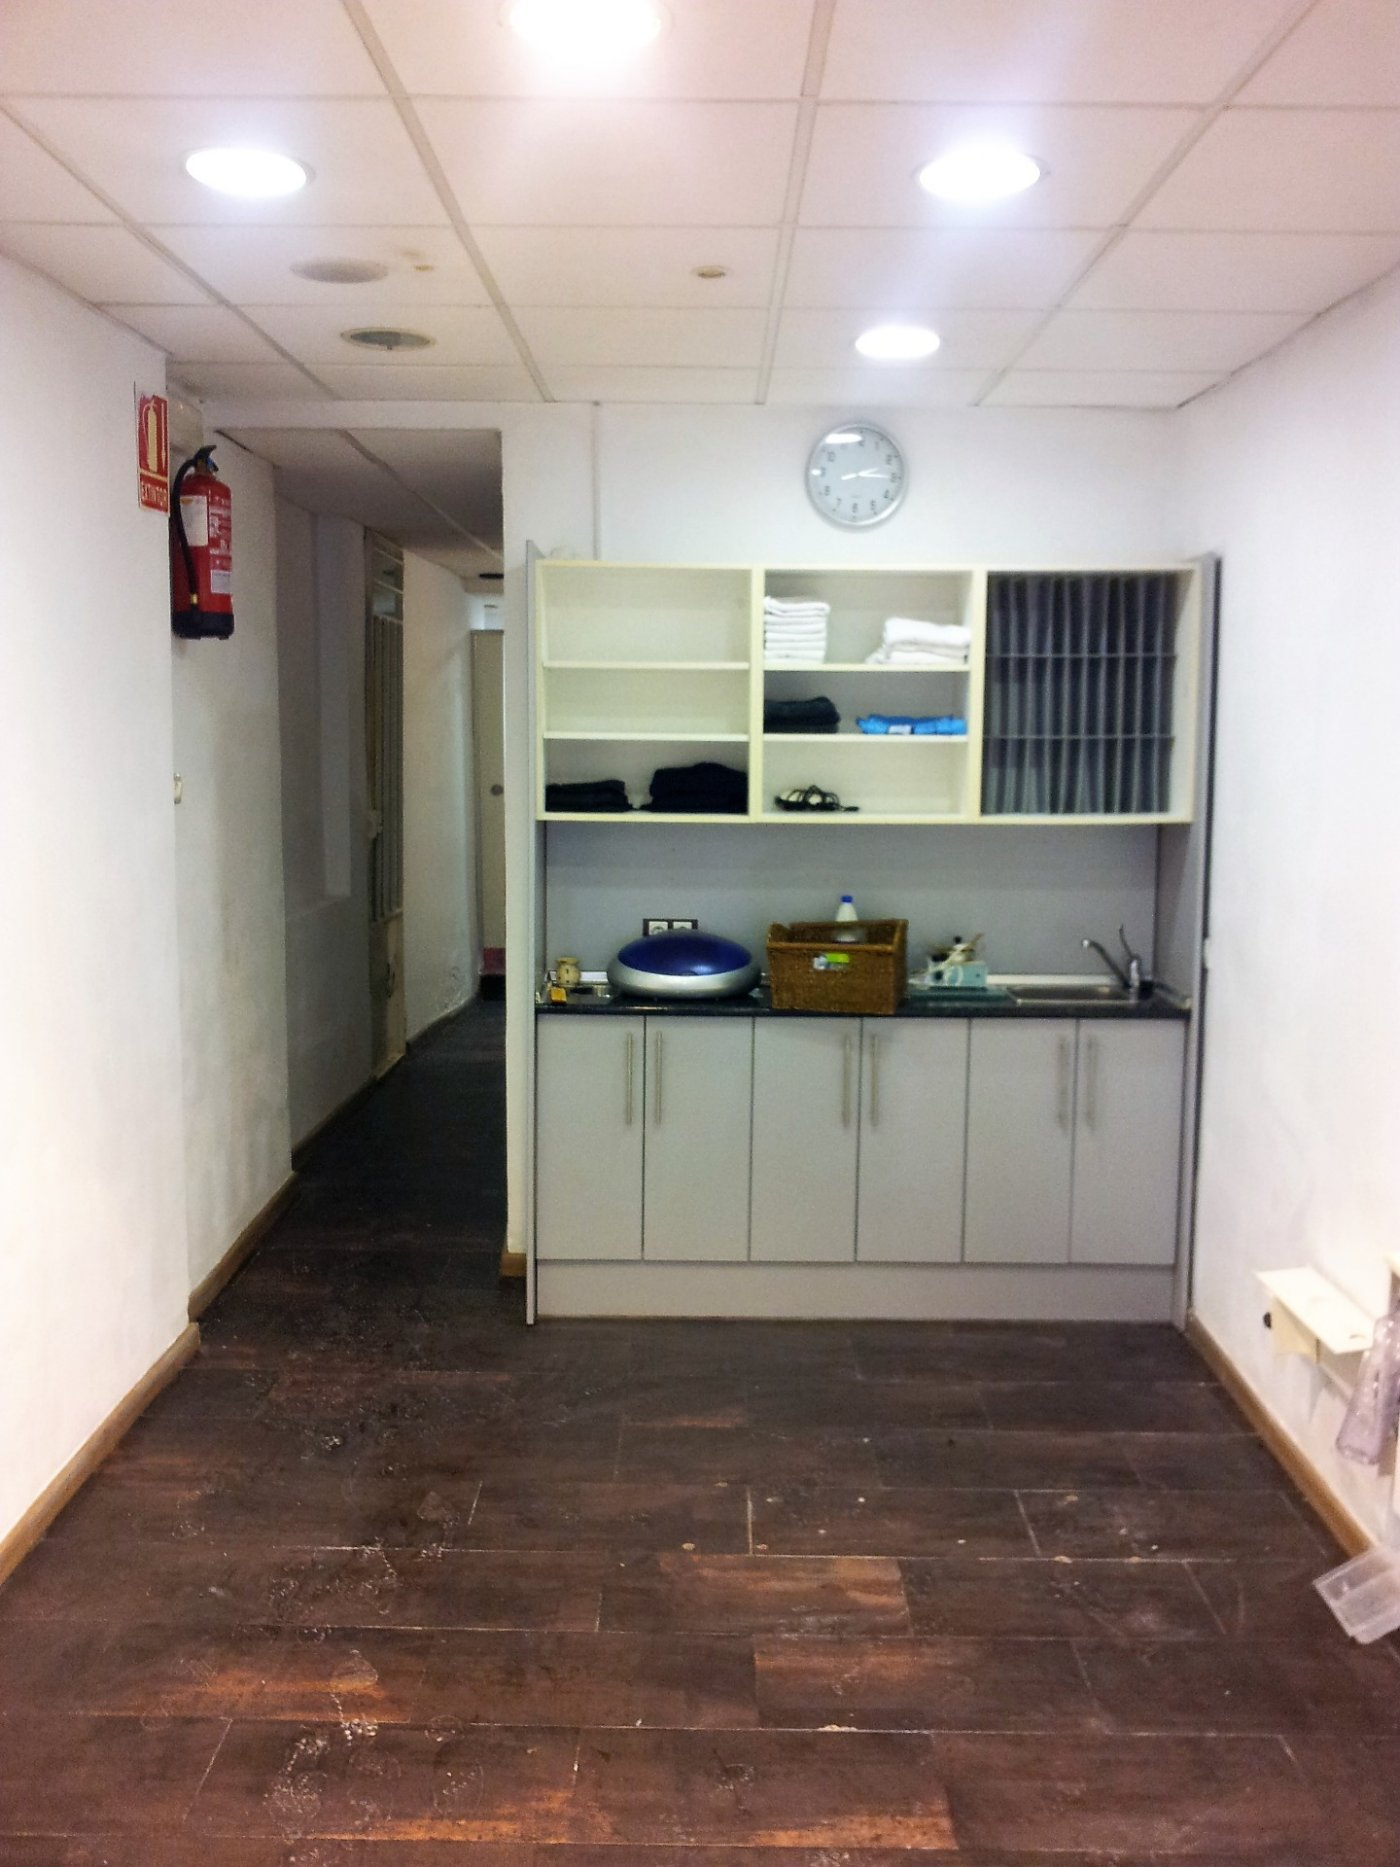 Local para almacén, despacho, oficina, etc. en el casco antiguo.